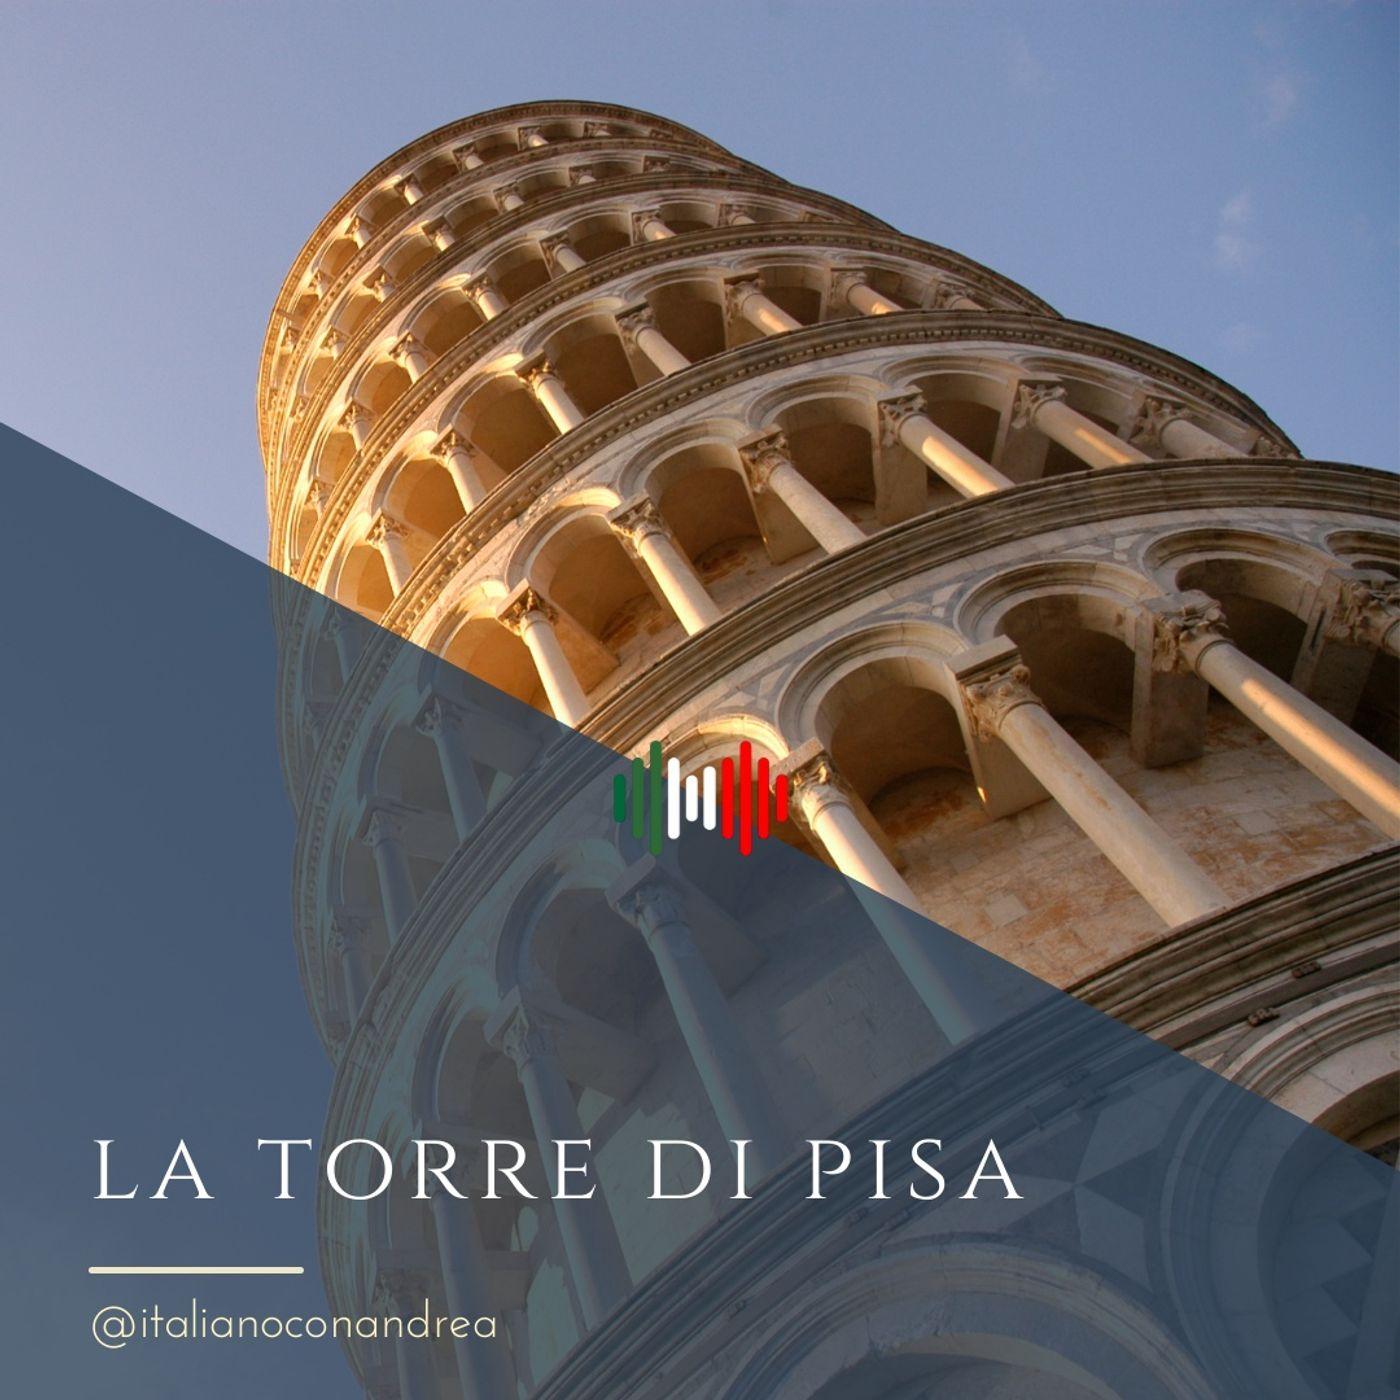 290. CULTURA: La Torre di Pisa